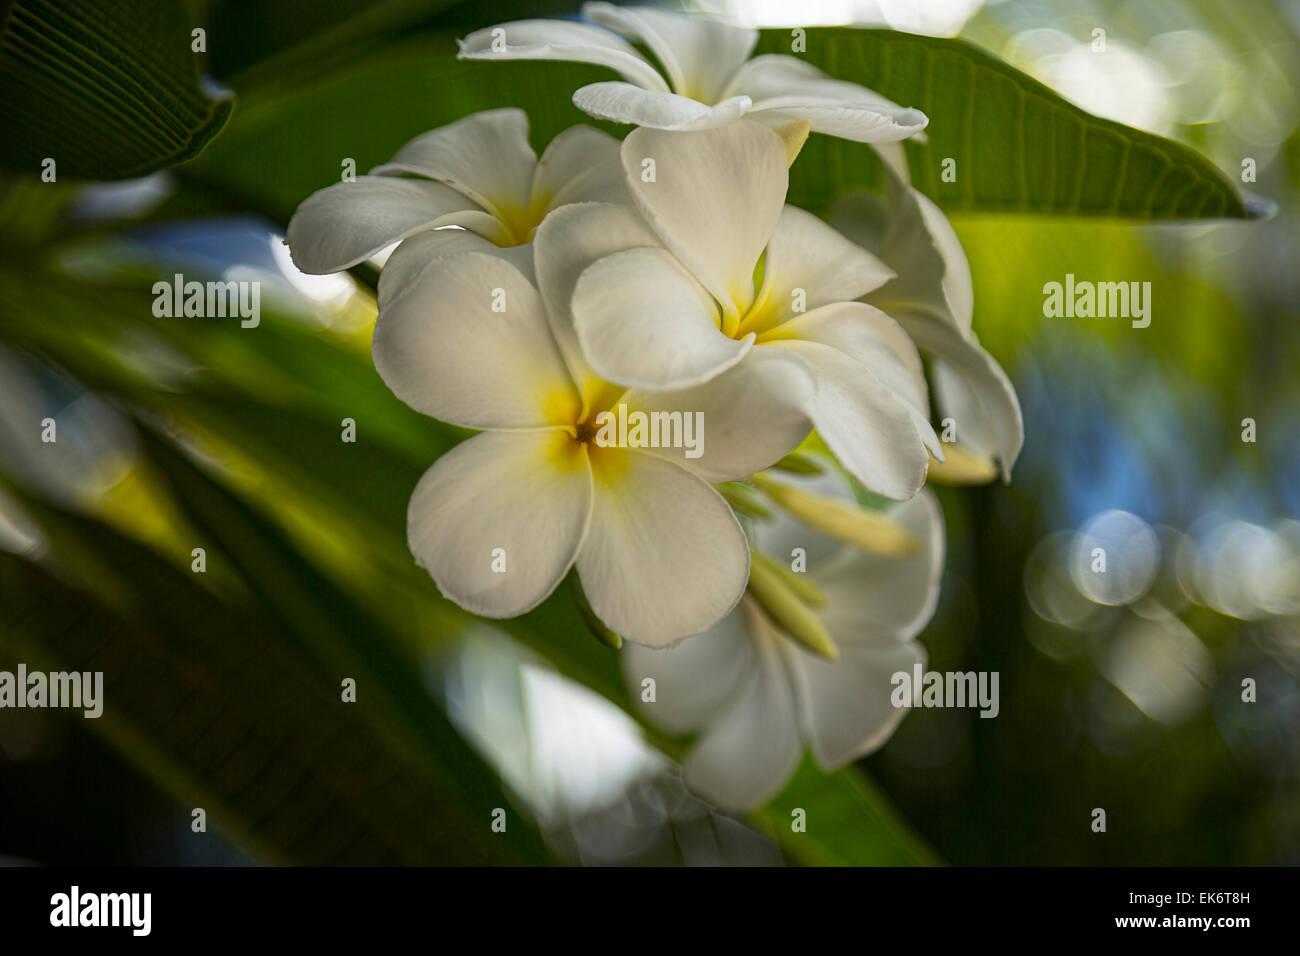 Bunch Of Frangipani Flowers In Closeup Stock Photo 80670705 Alamy